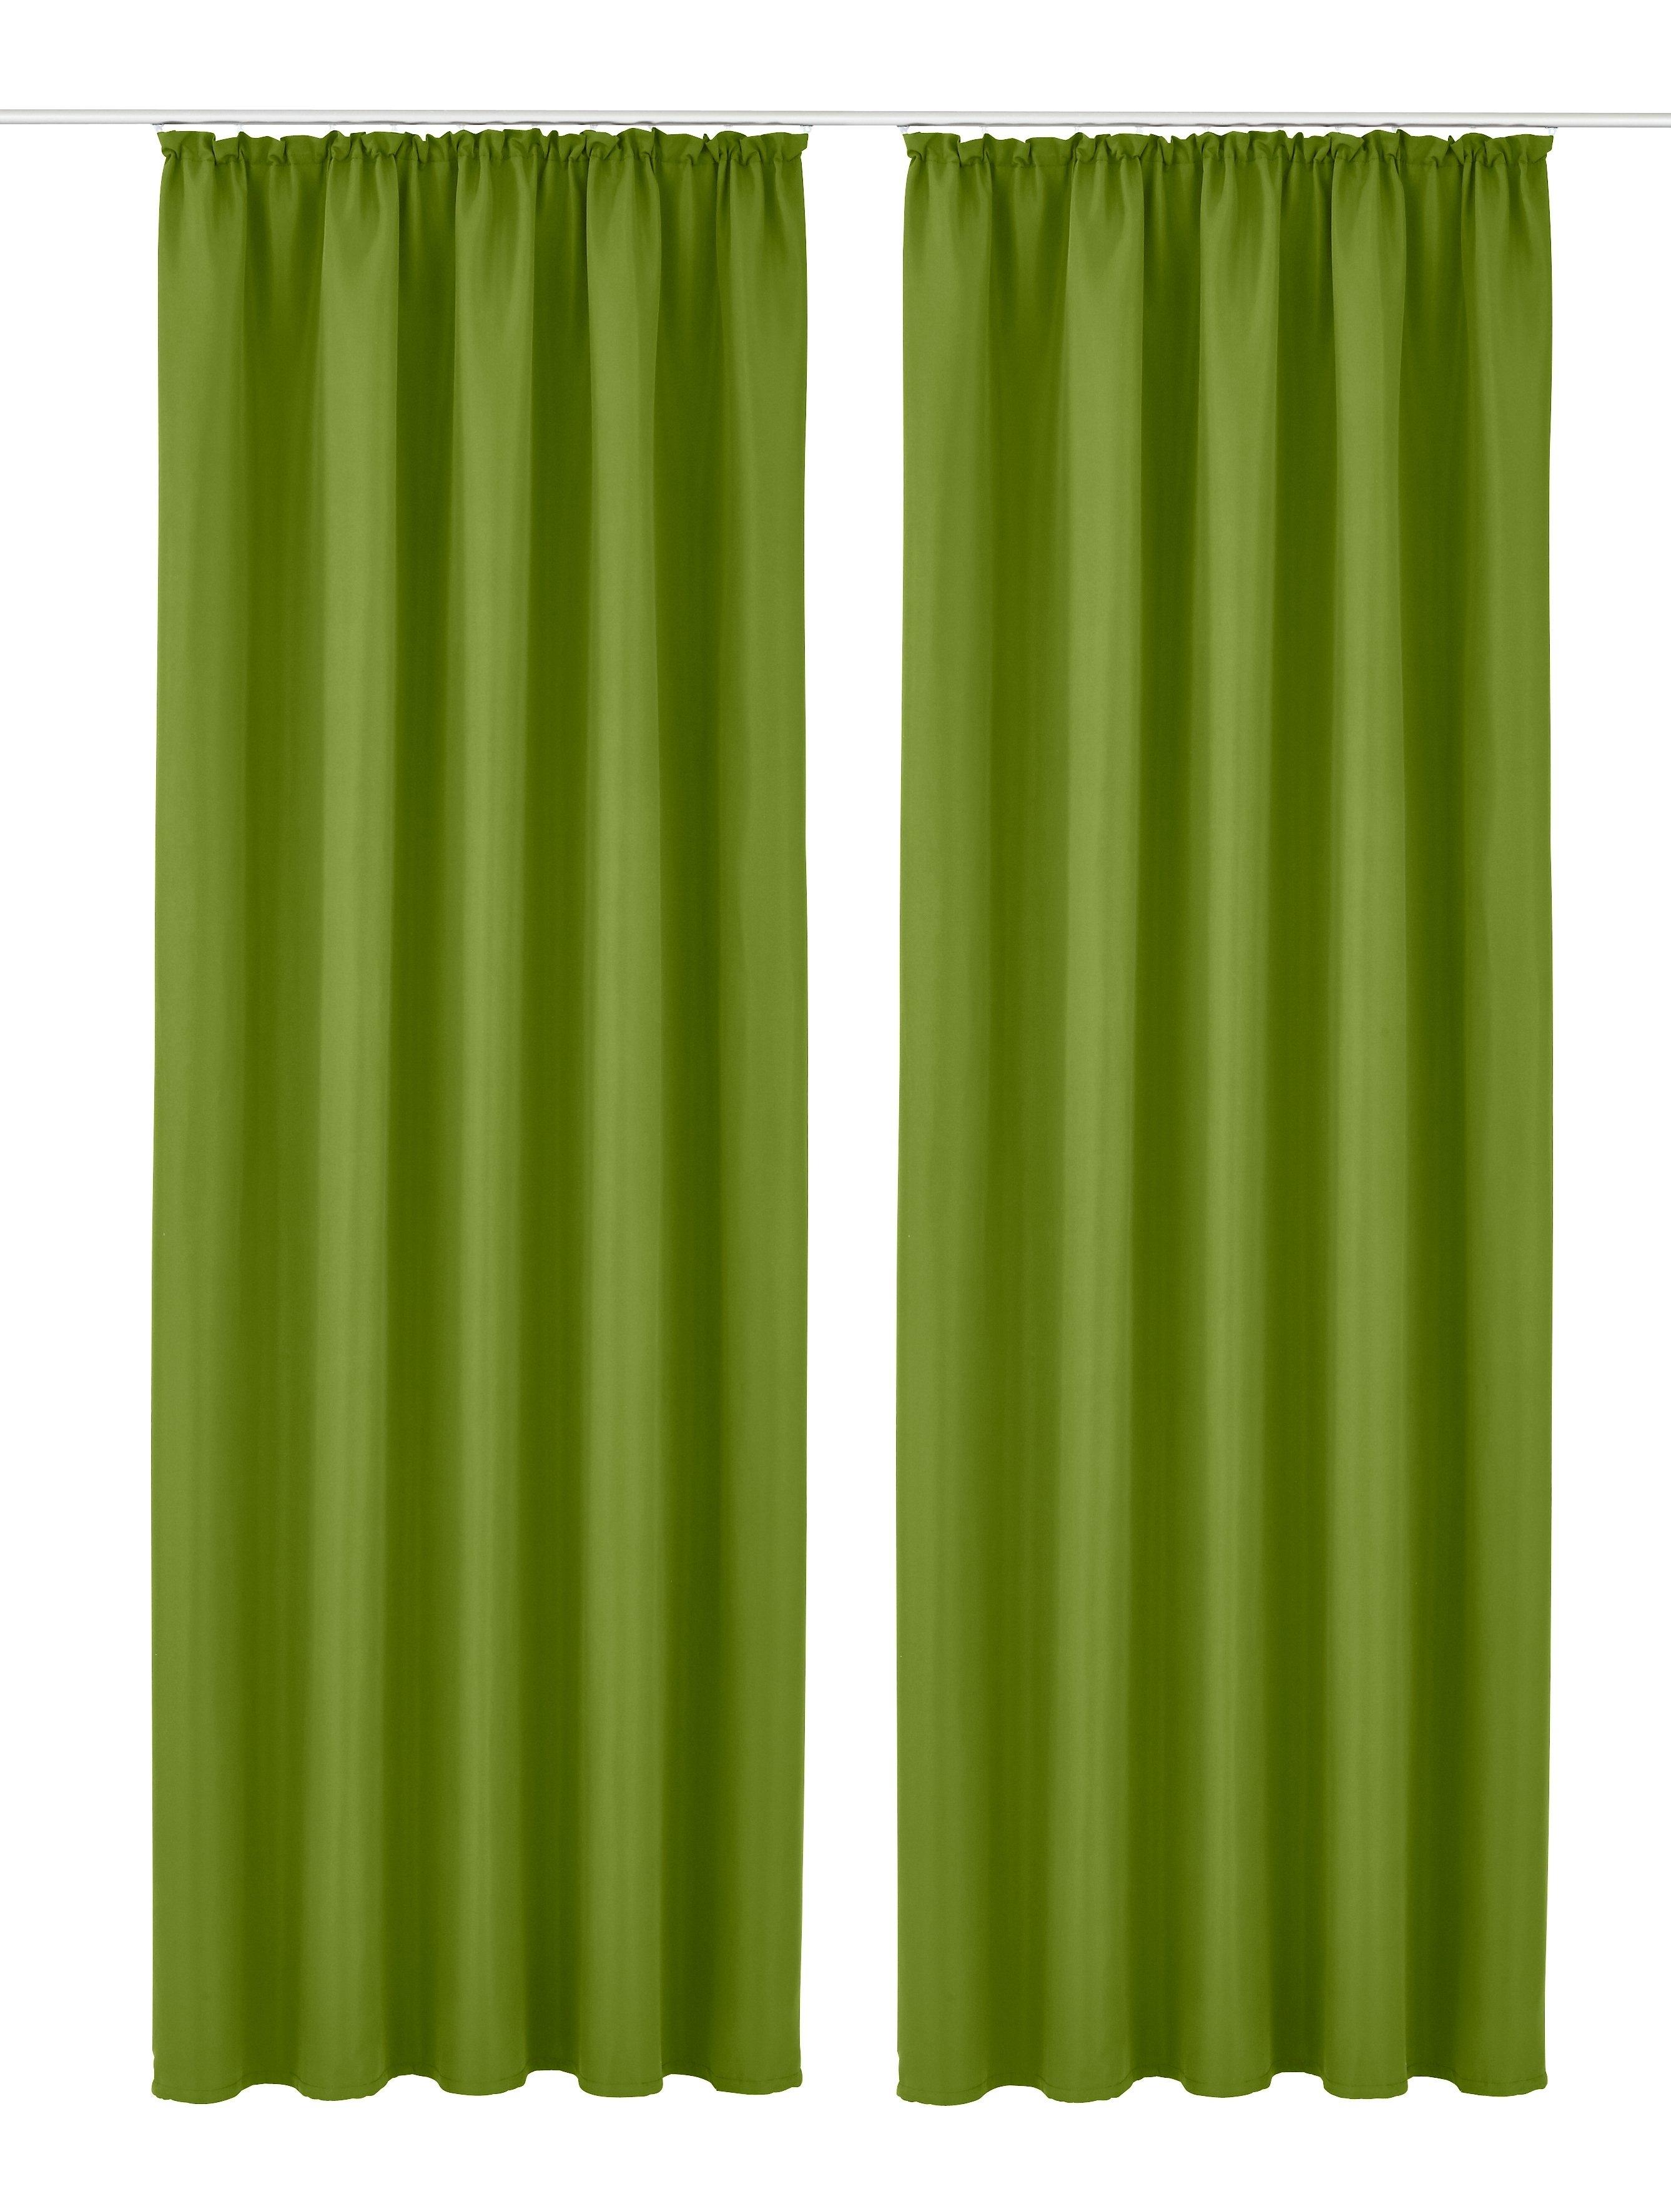 https://i.otto.nl/i/otto/15143092/gordijn-my-home-raja-met-rimpelband-set-van-2-groen.jpg?$ovnl_seo_index$